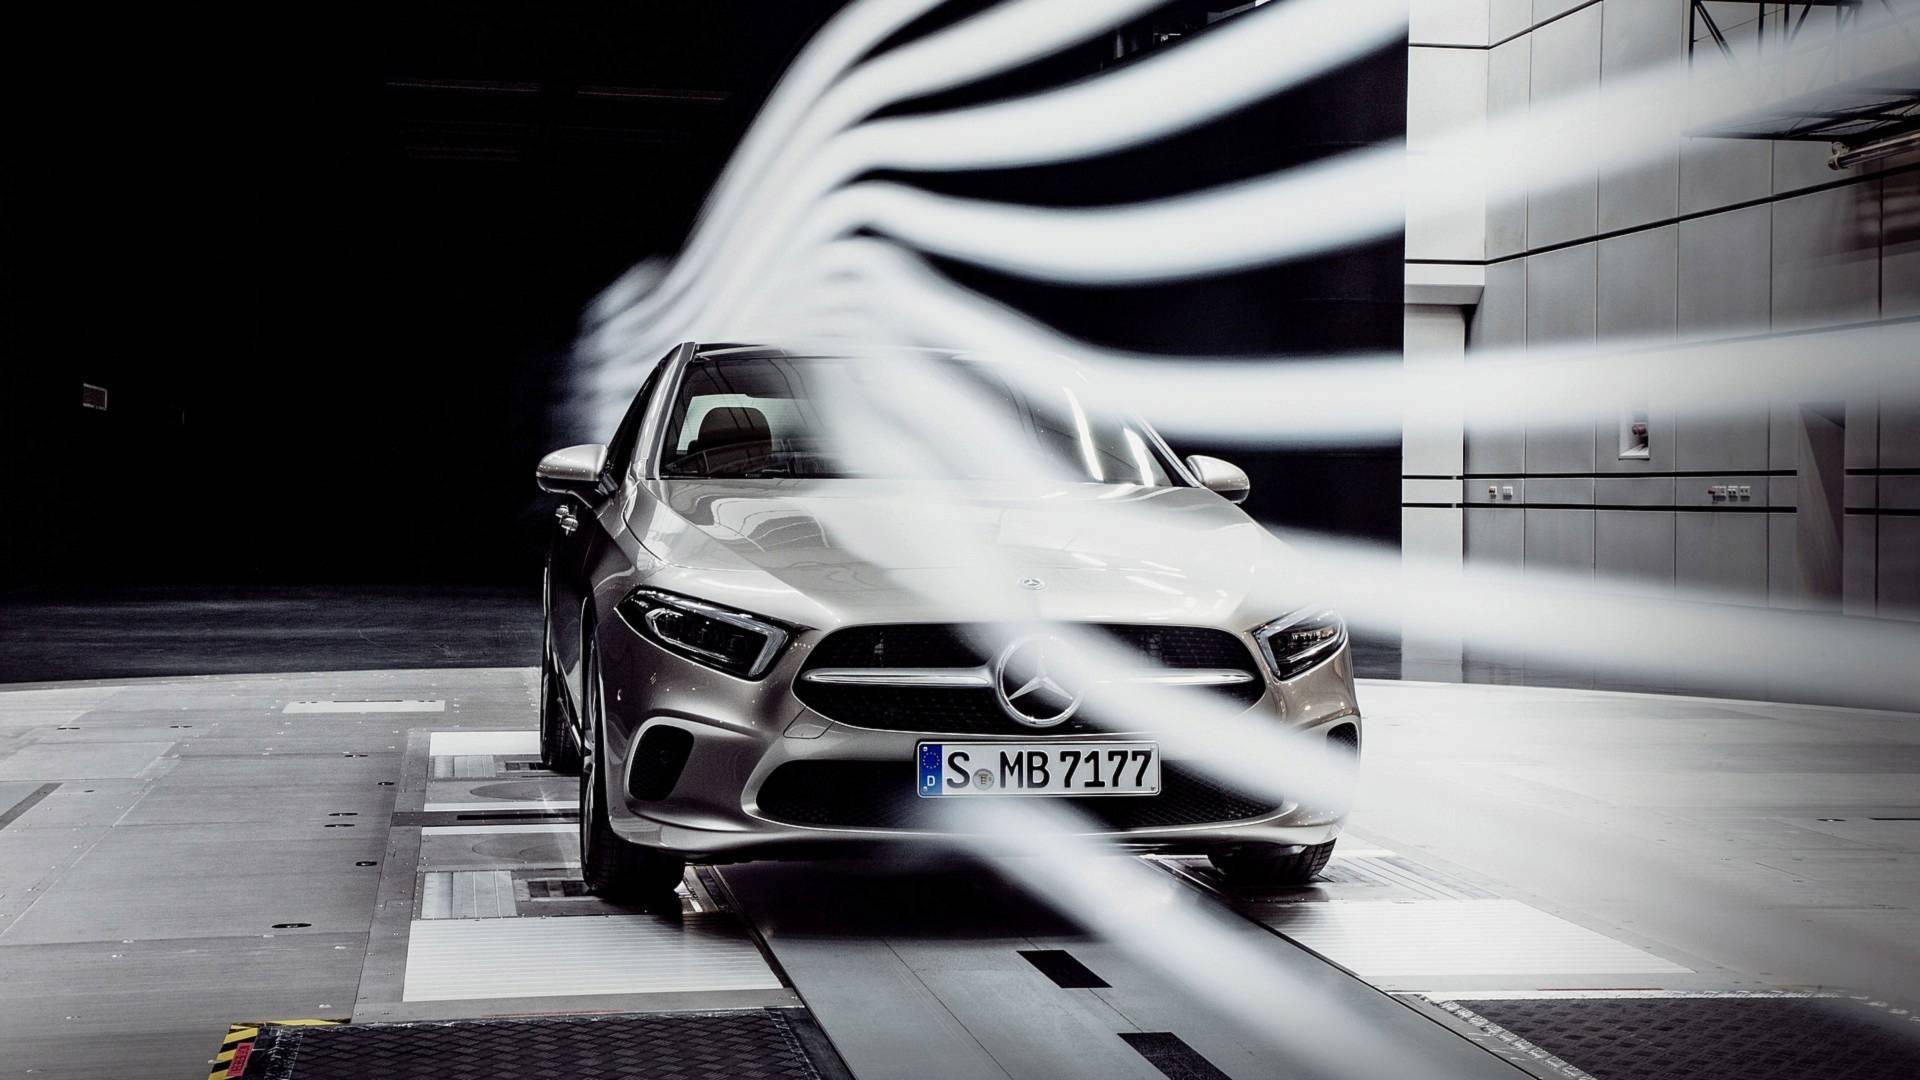 Mercedes Benz A Class Sedan Teased As The Most Aerodynamic